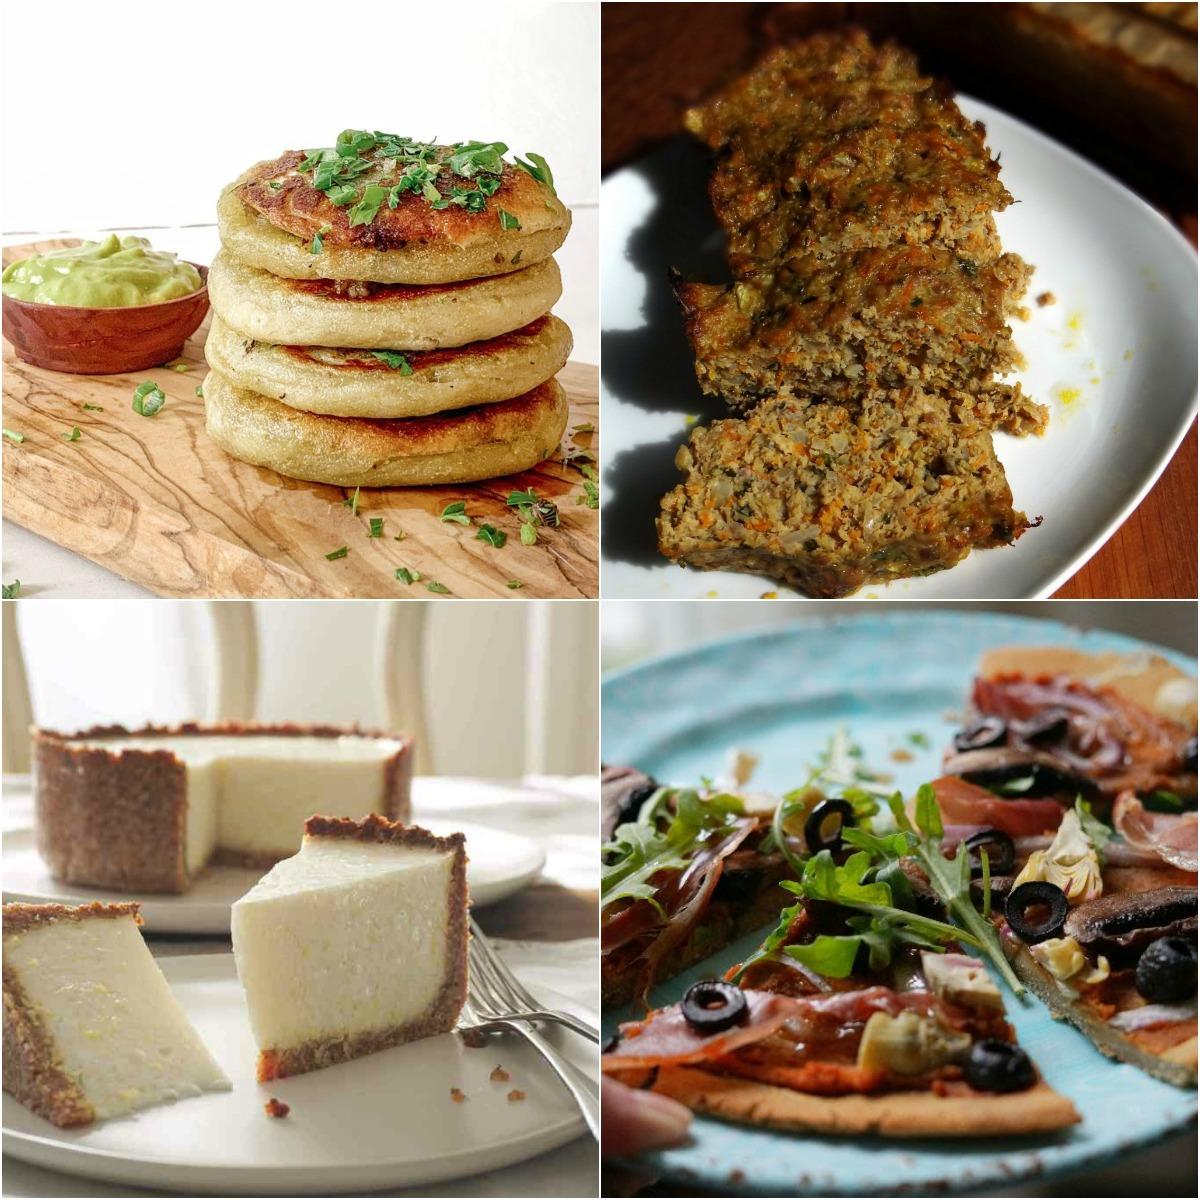 Paleo AIP Recipe Roundtable #324 | Phoenix Helix - *Featured Recipes: Stuffed Sweet Potato Cakes, Lemon Tart, Magic Meatloaf, and Mediterranean Flatbread Pizza